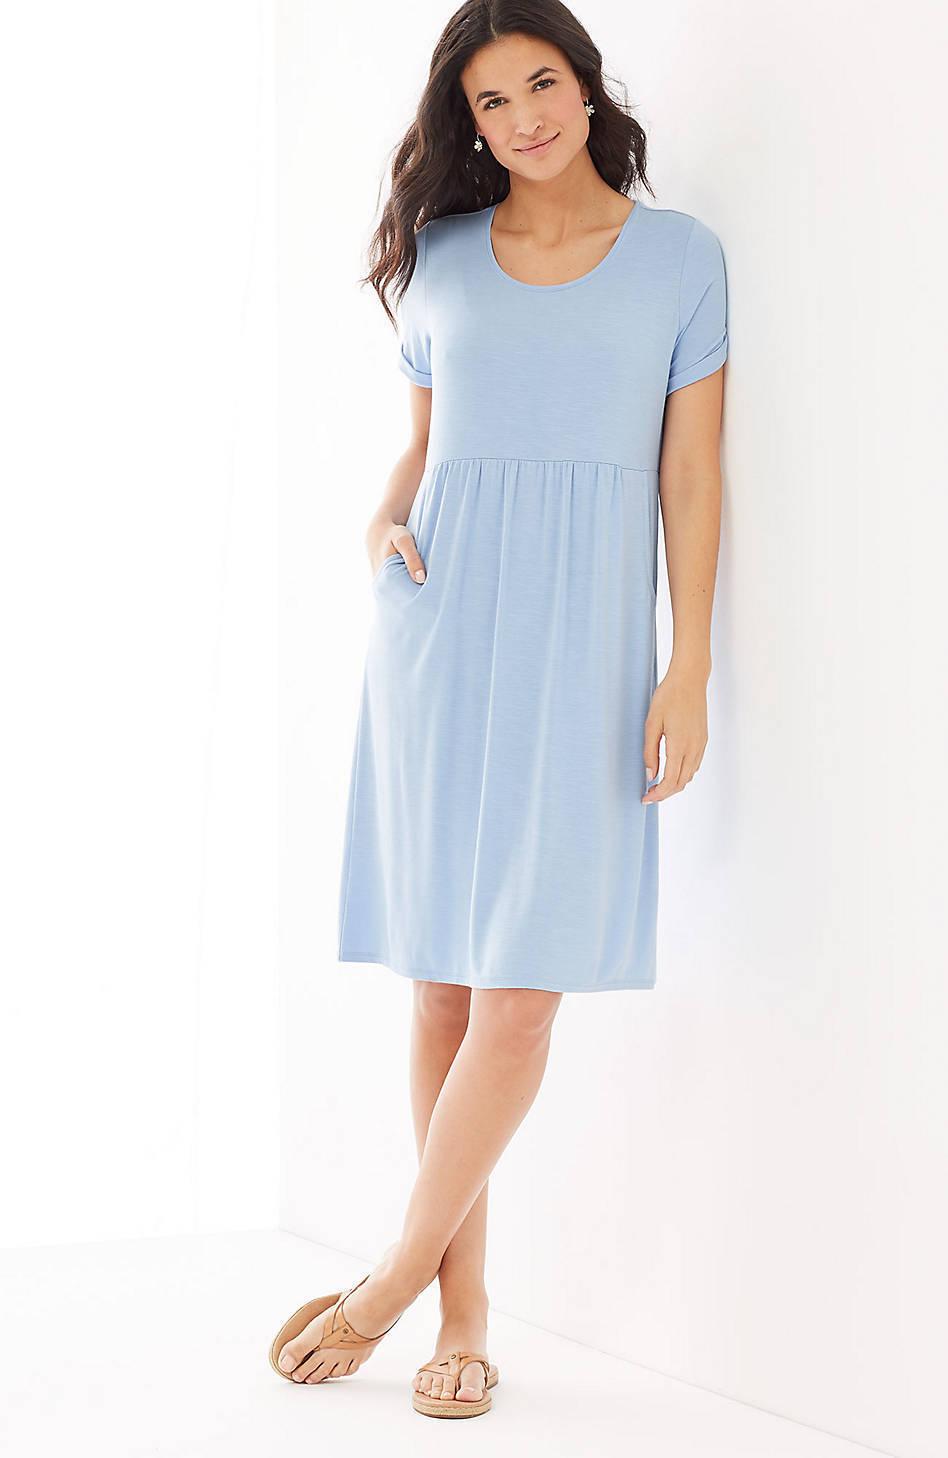 J. Jill - L(14 16) - Soft and Comfortable Clear Blau Scoop-Neck Knit Dress NWT